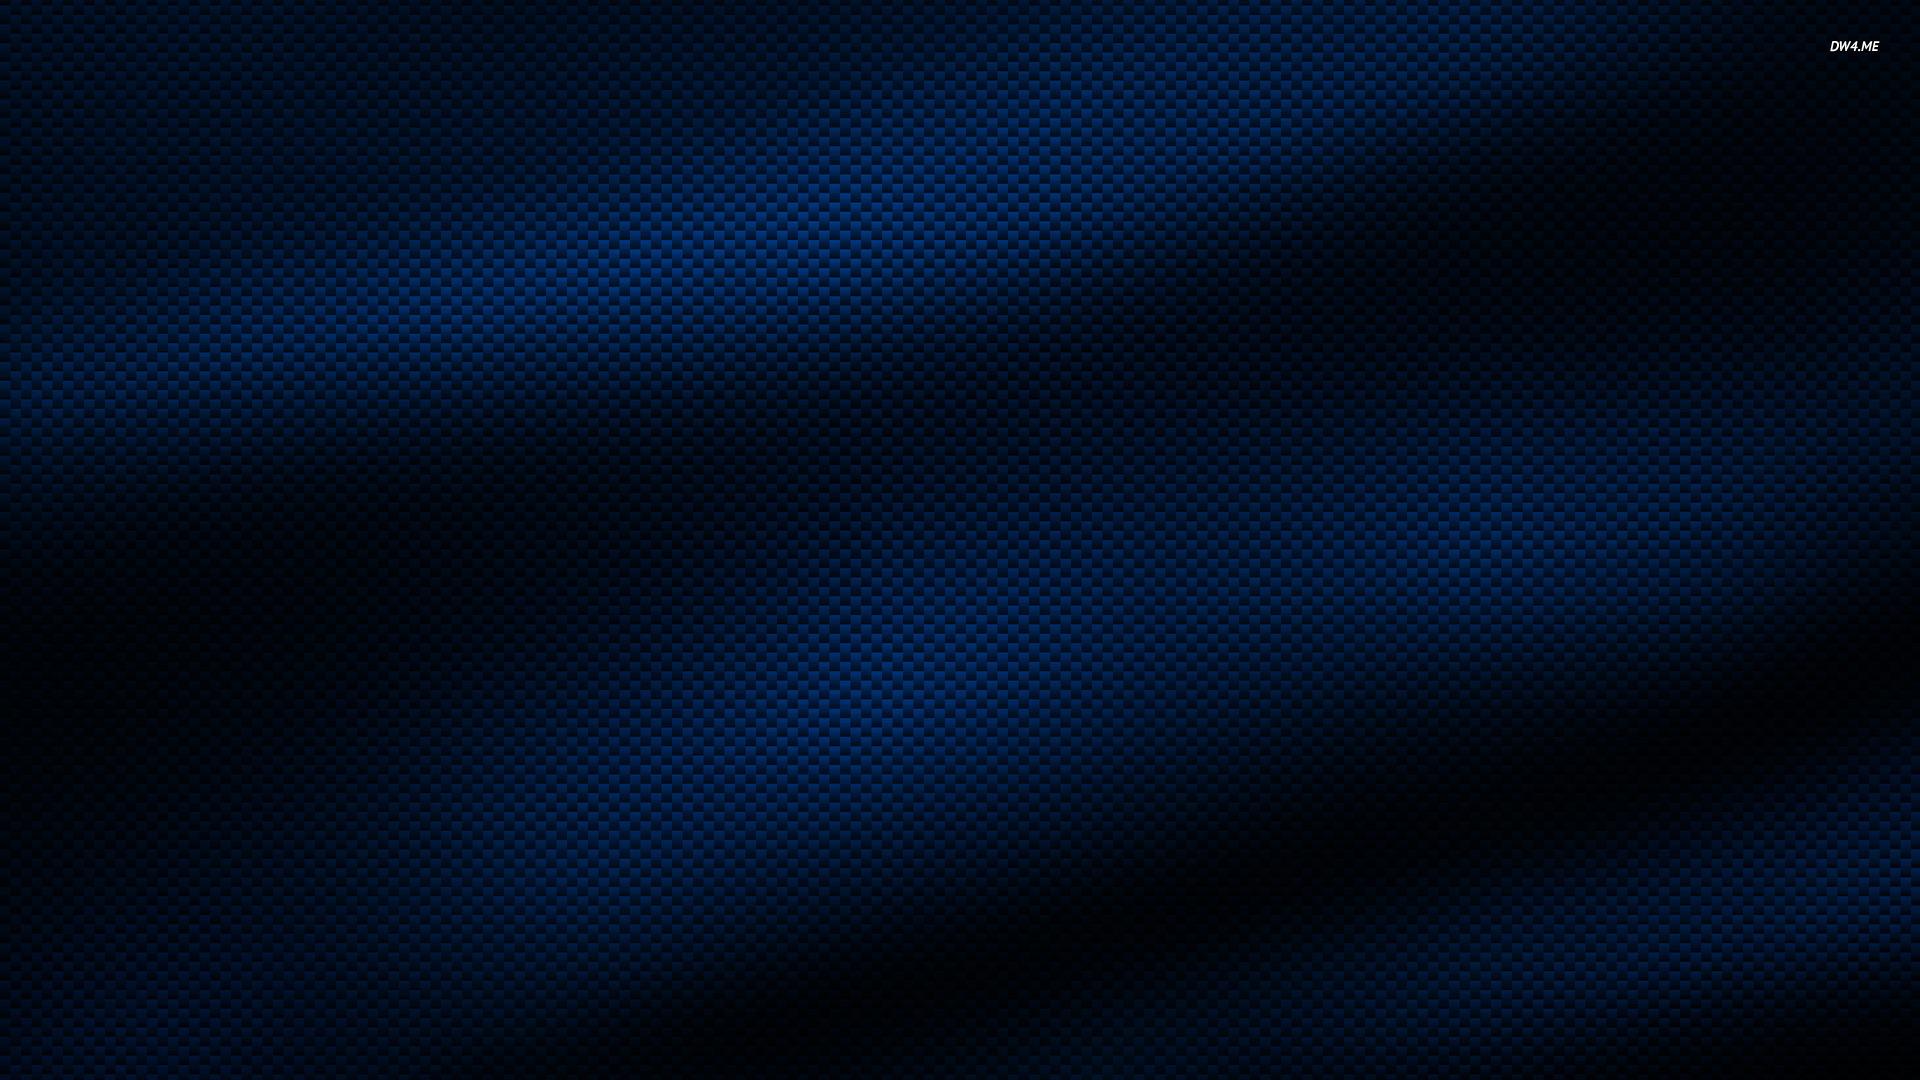 Carbon fiber fabric wallpaper   Abstract wallpapers   869 1920x1080